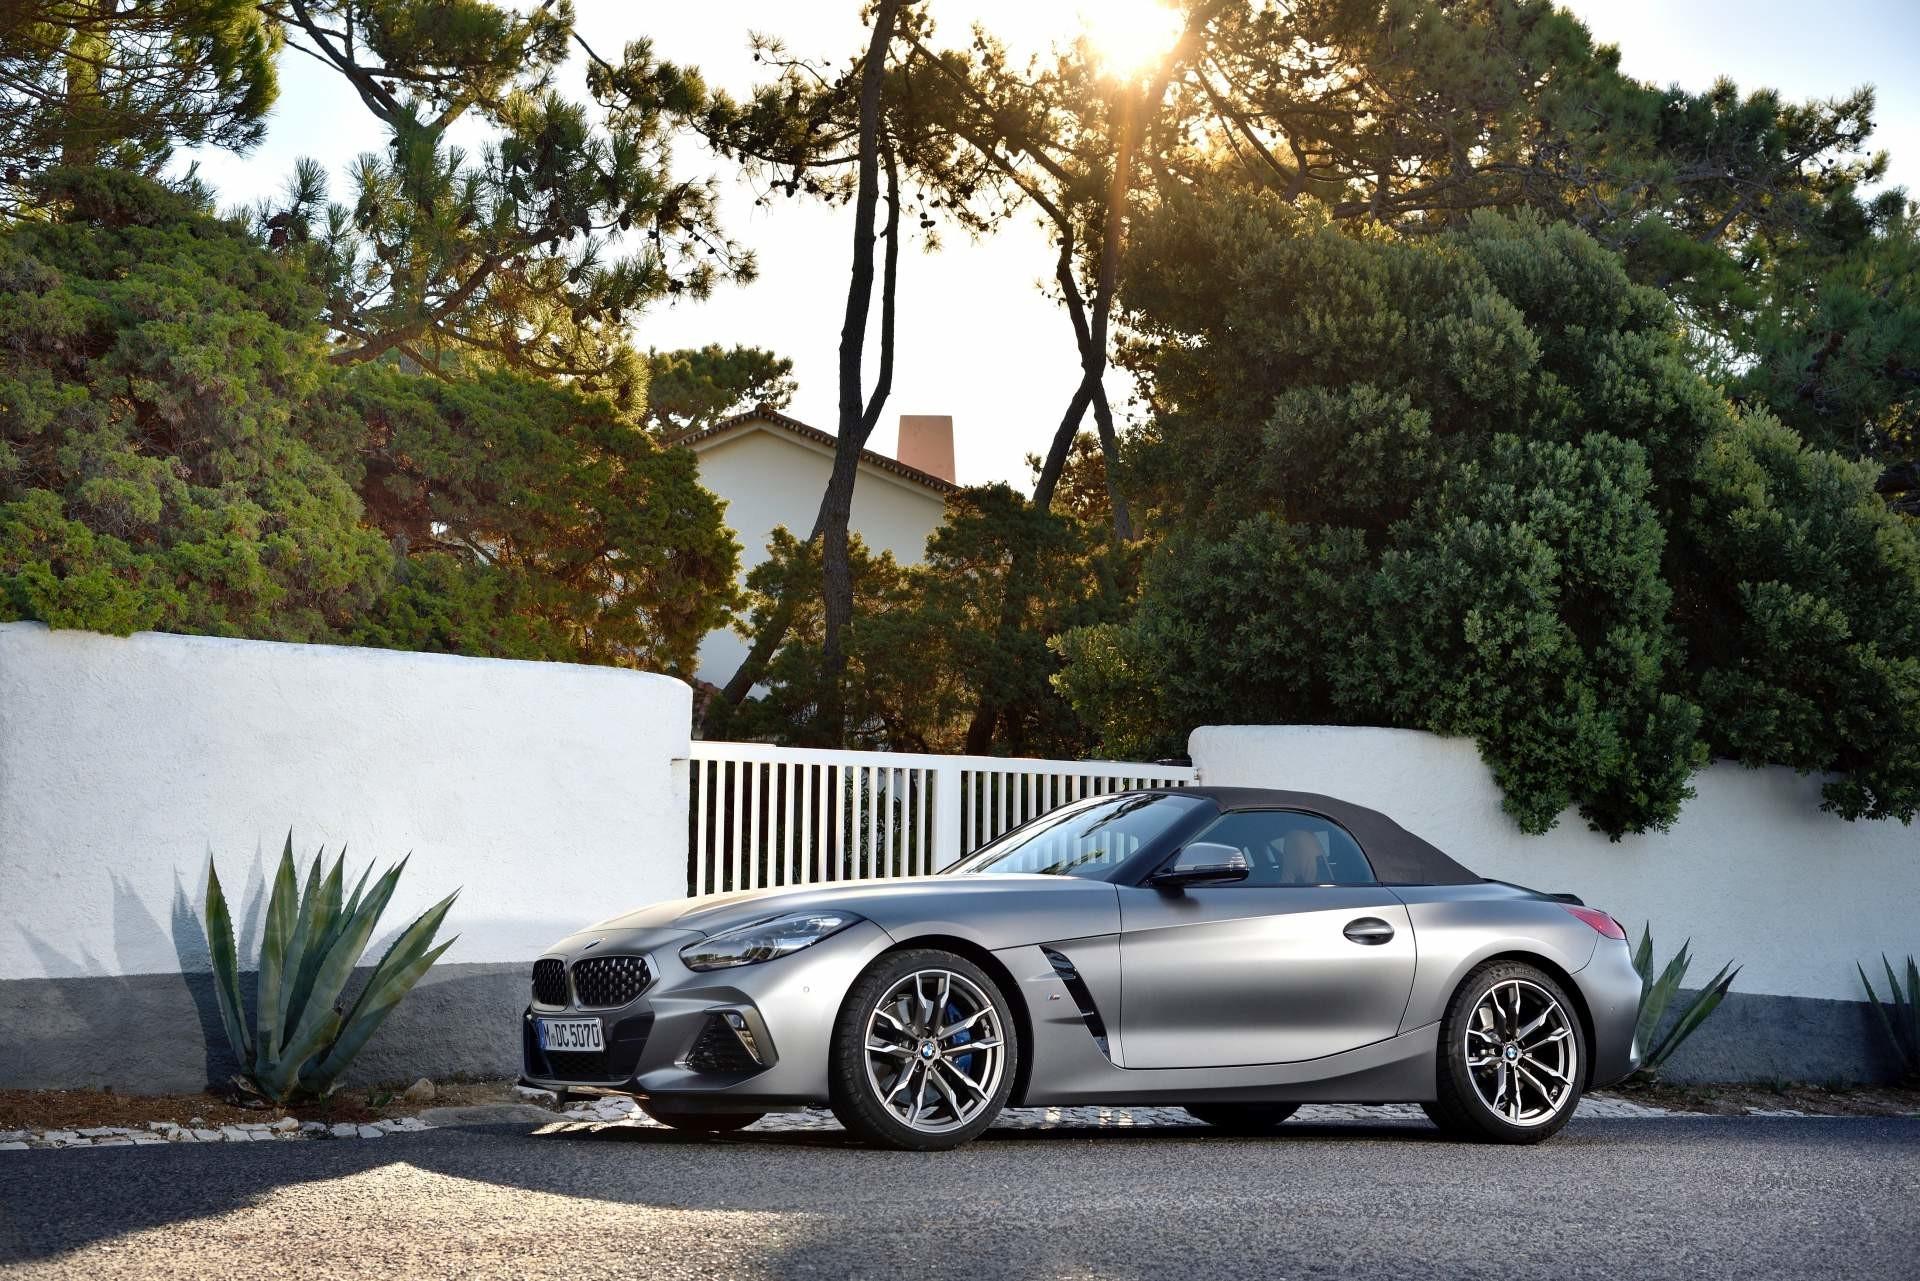 Foto de BMW Z4 M40i 2019 (39/84)